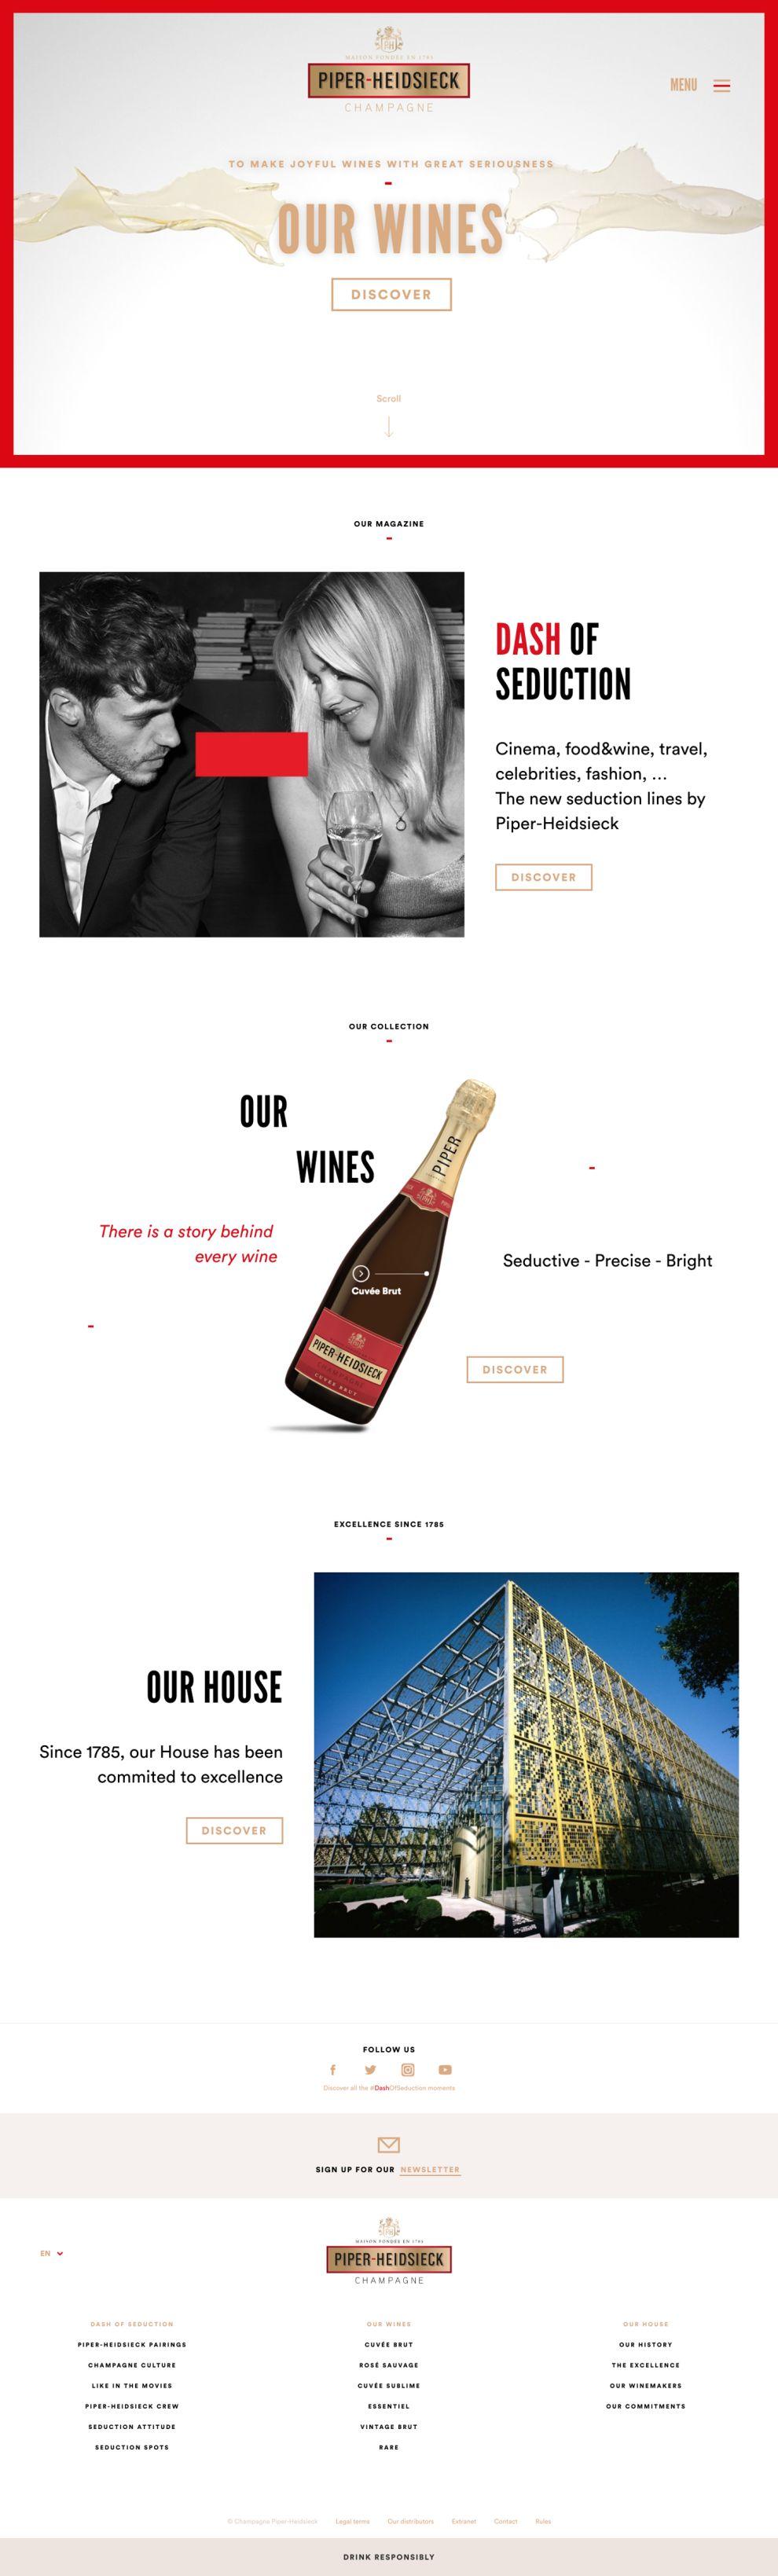 Piper-Heidsieck Awesome Homepage